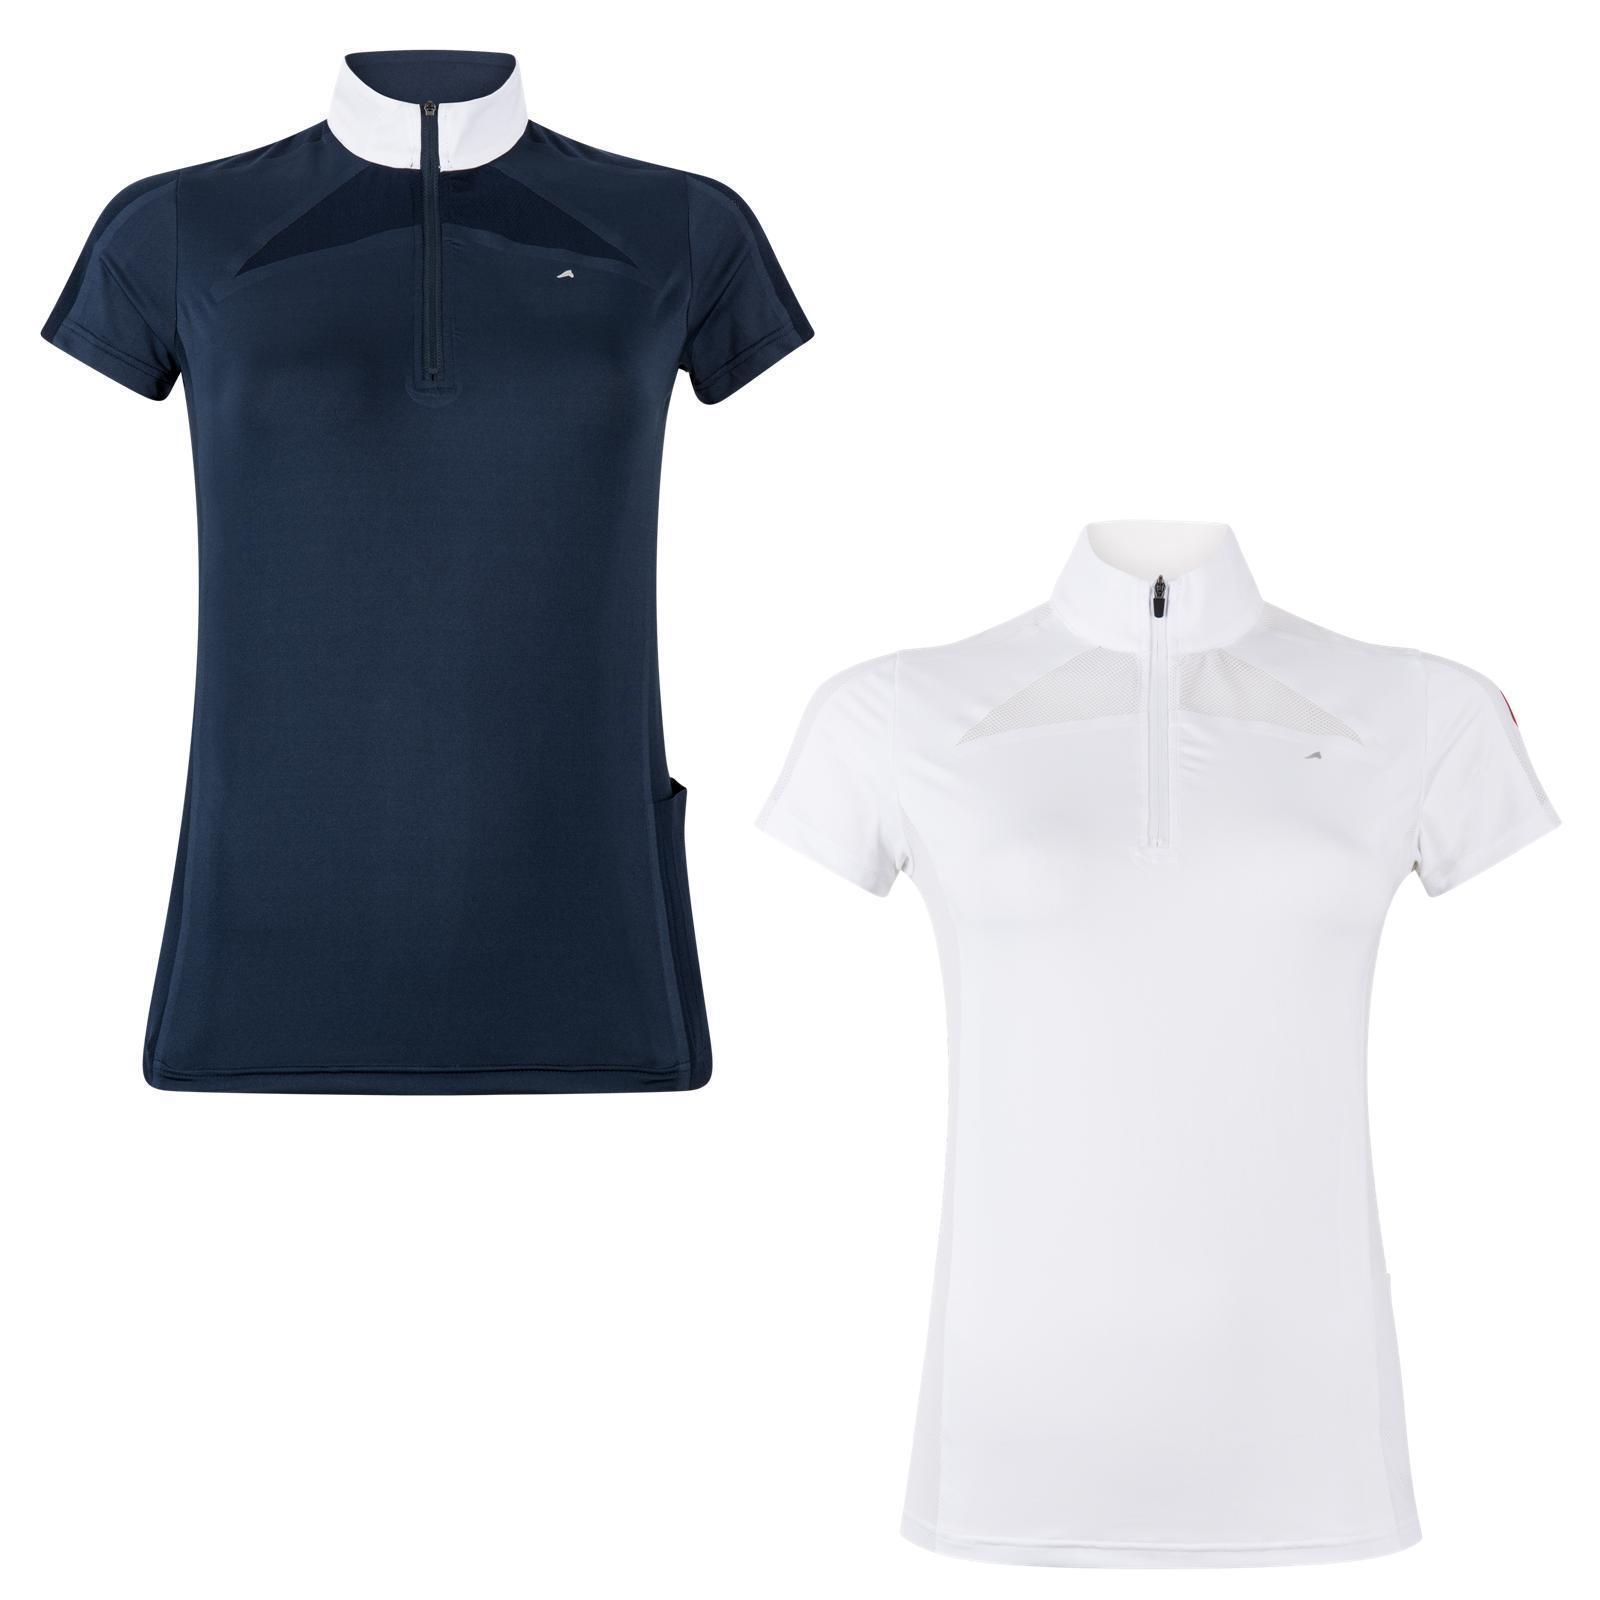 Euro-star Damenshirt   TABEA   funktionelles T-Shirt mit Polygiene-Finish